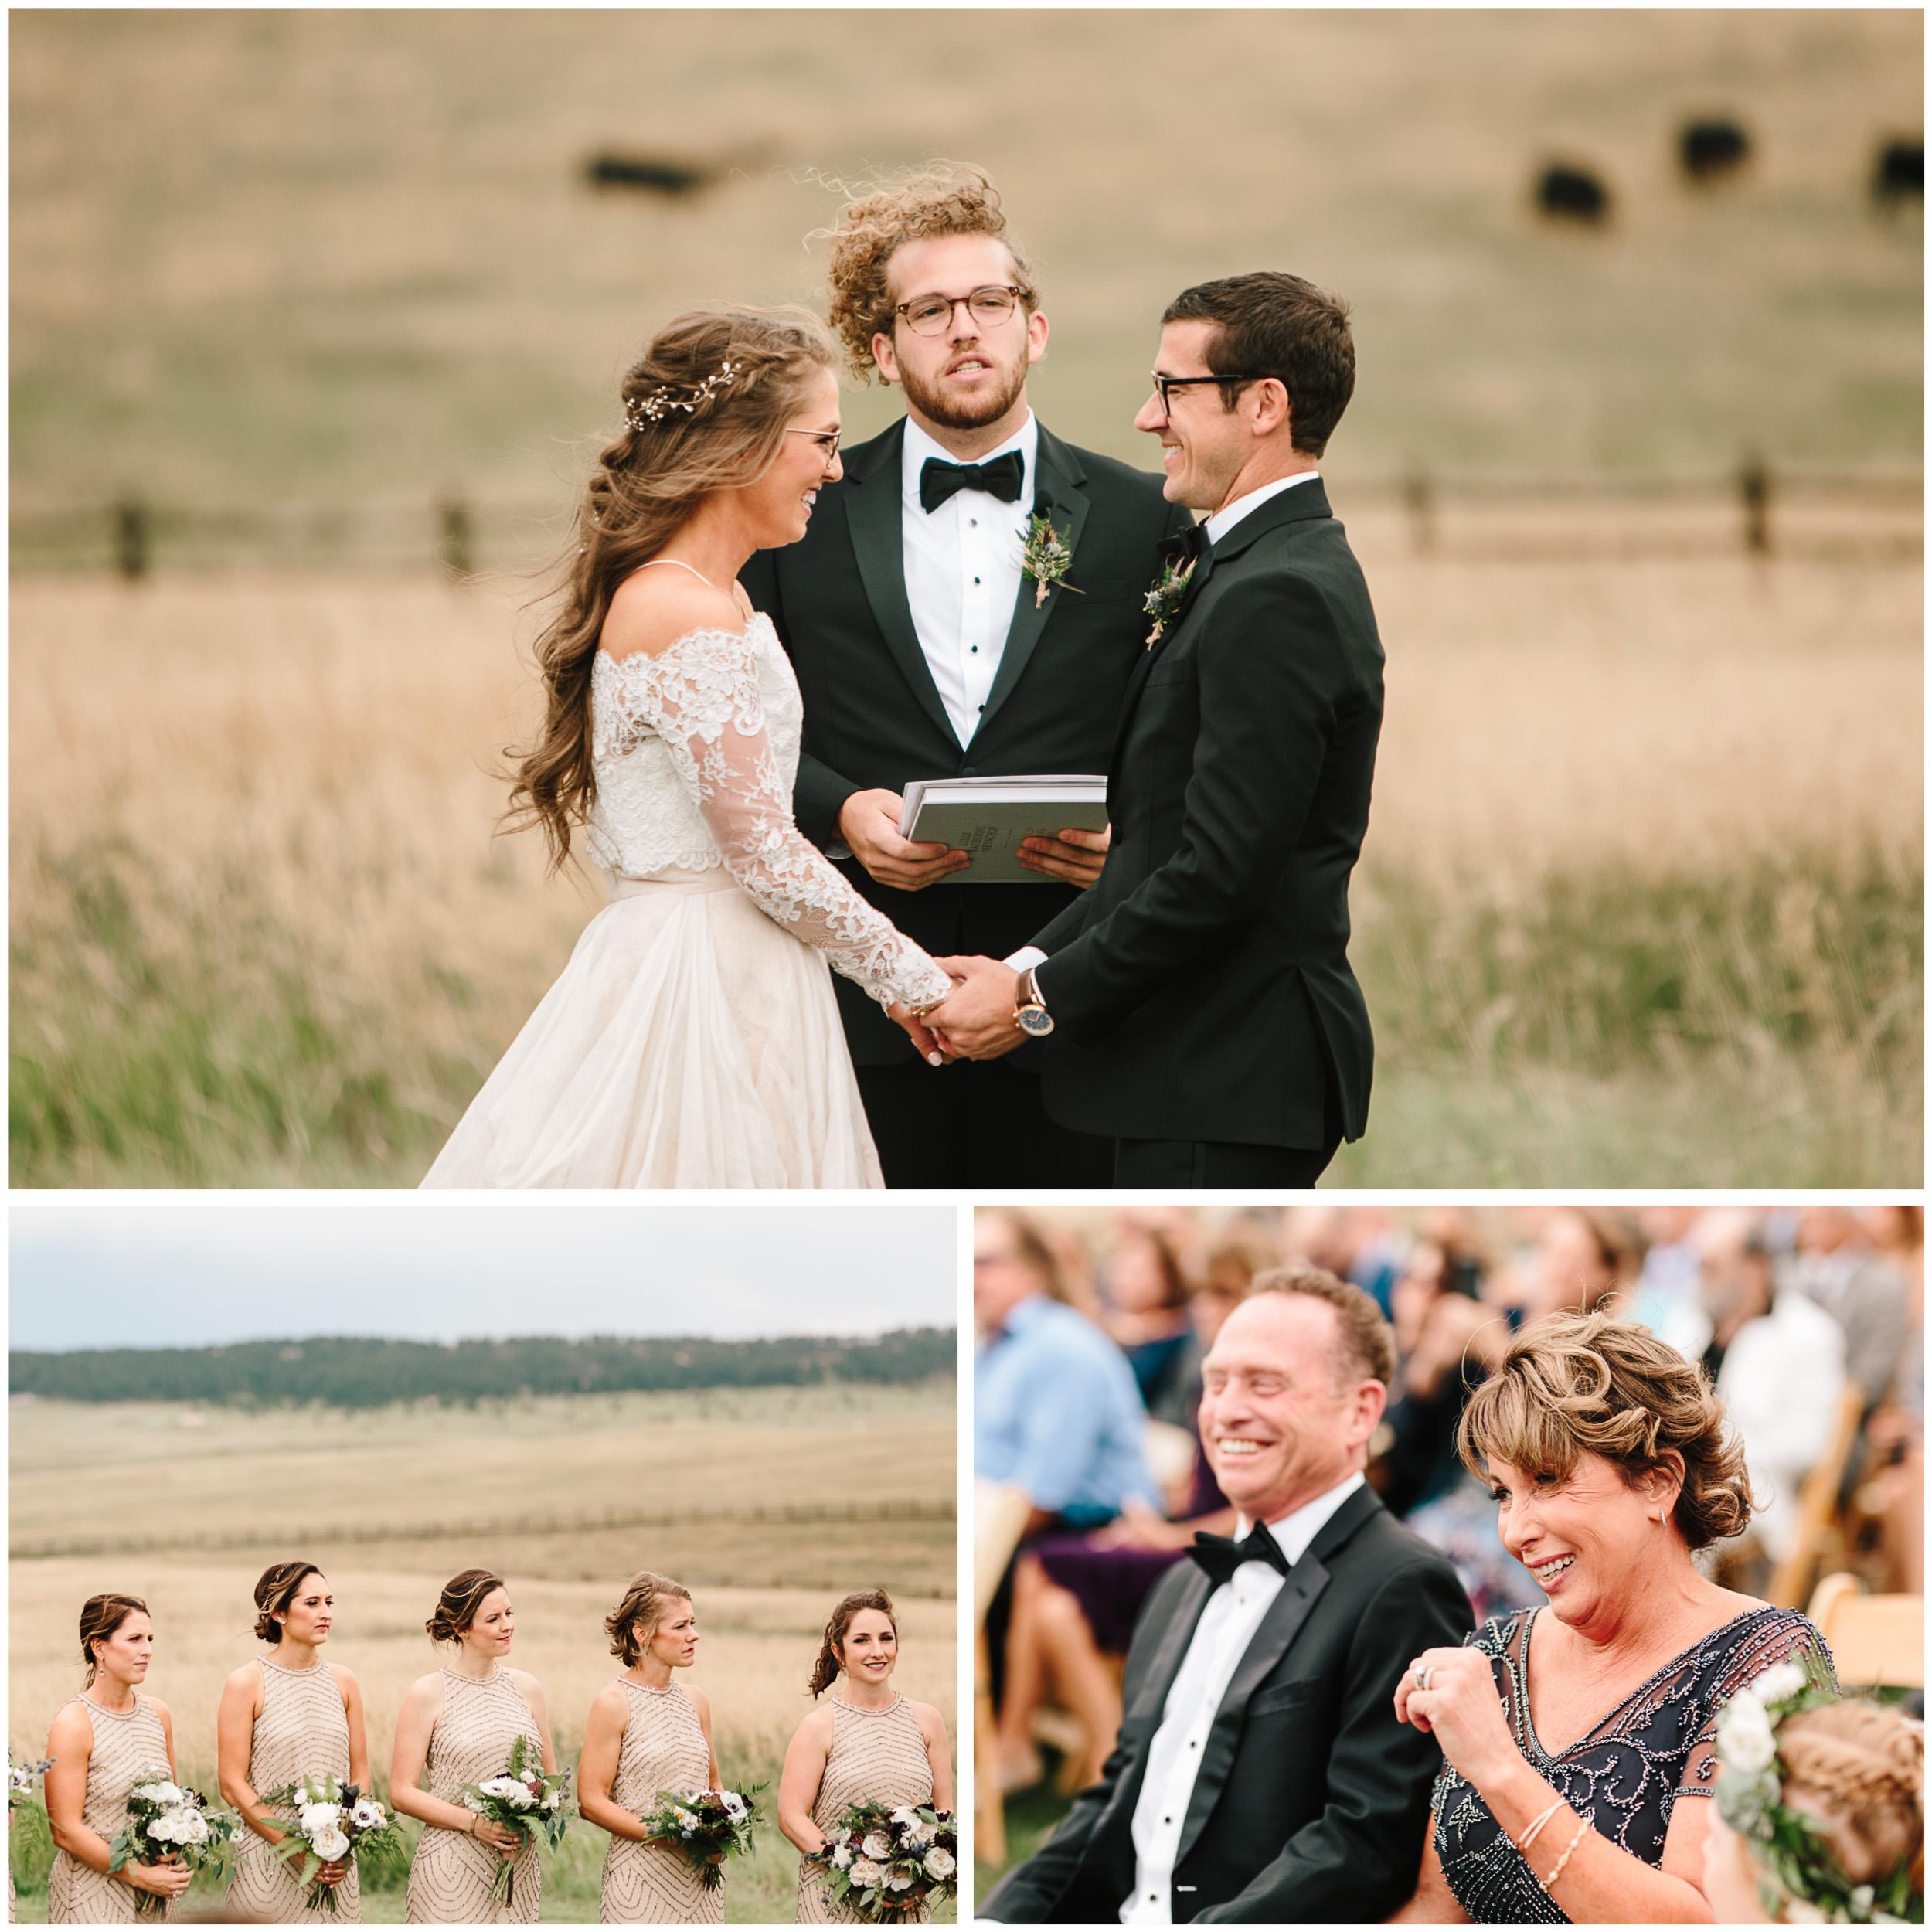 spruce_mountain_ranch_wedding_53.jpg